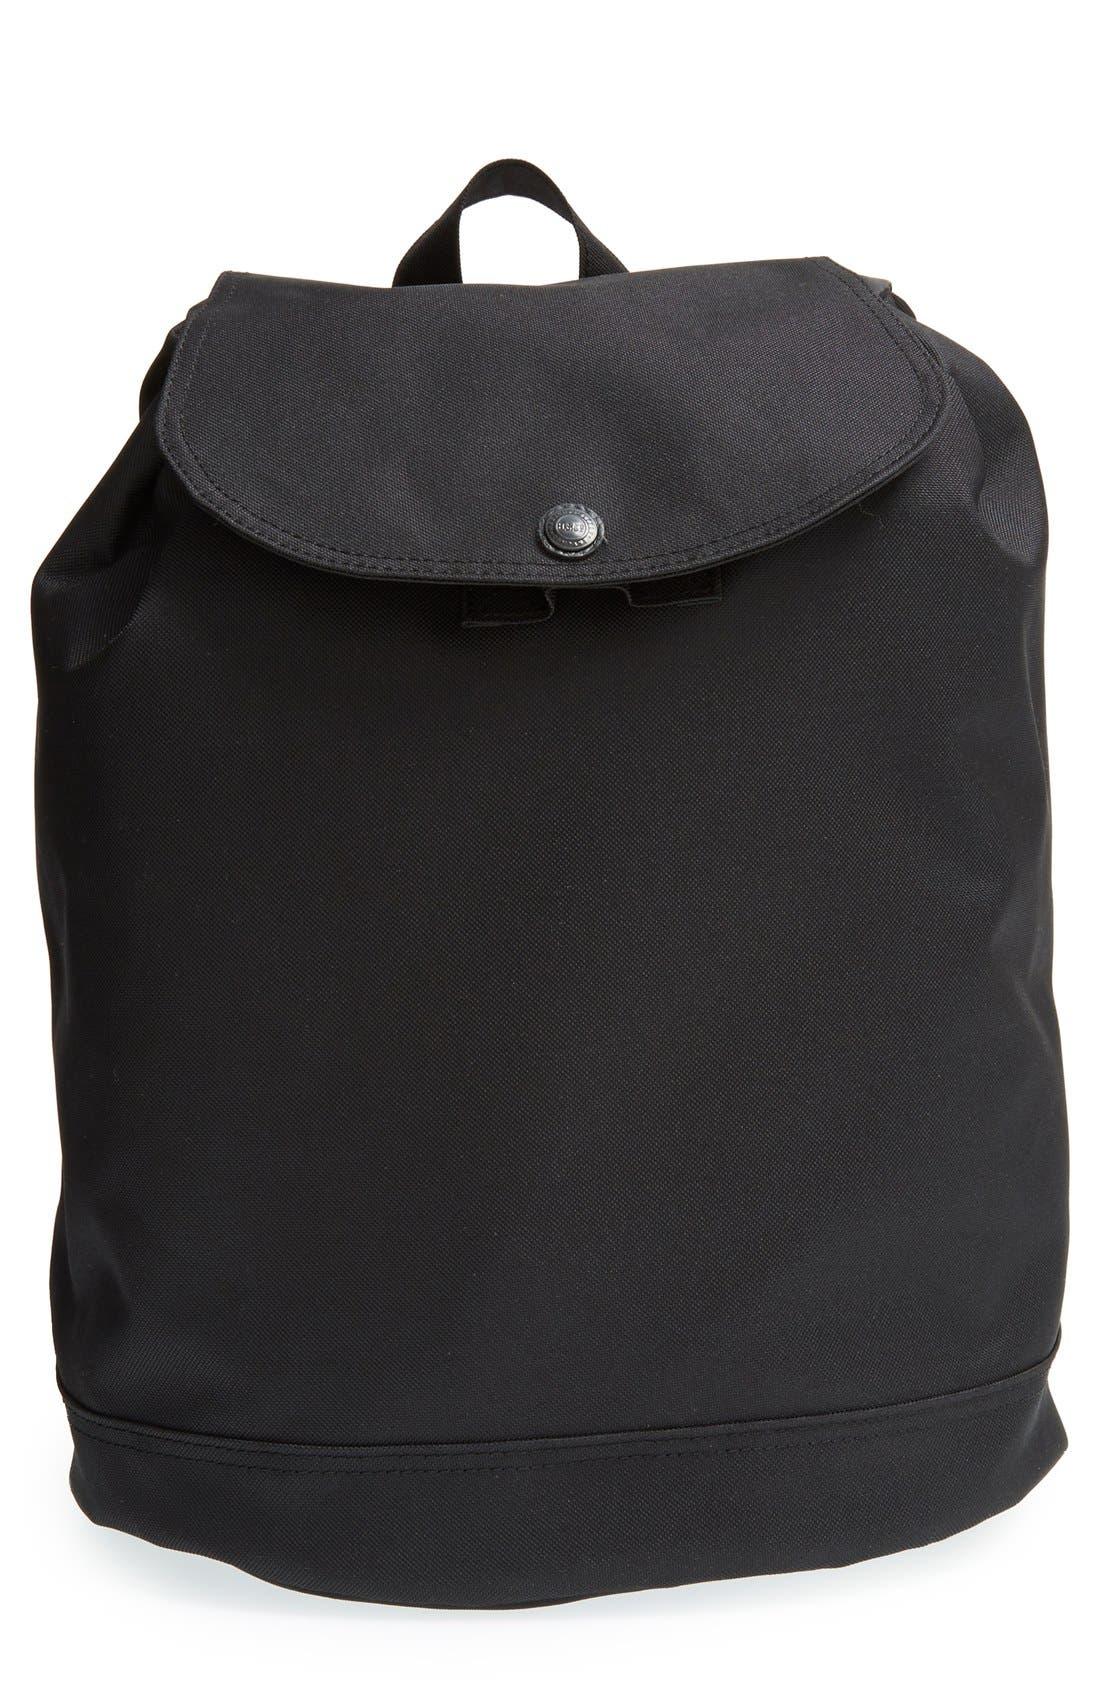 Alternate Image 1 Selected - Herschel Supply Co 'Reid' Mid Volume Backpack